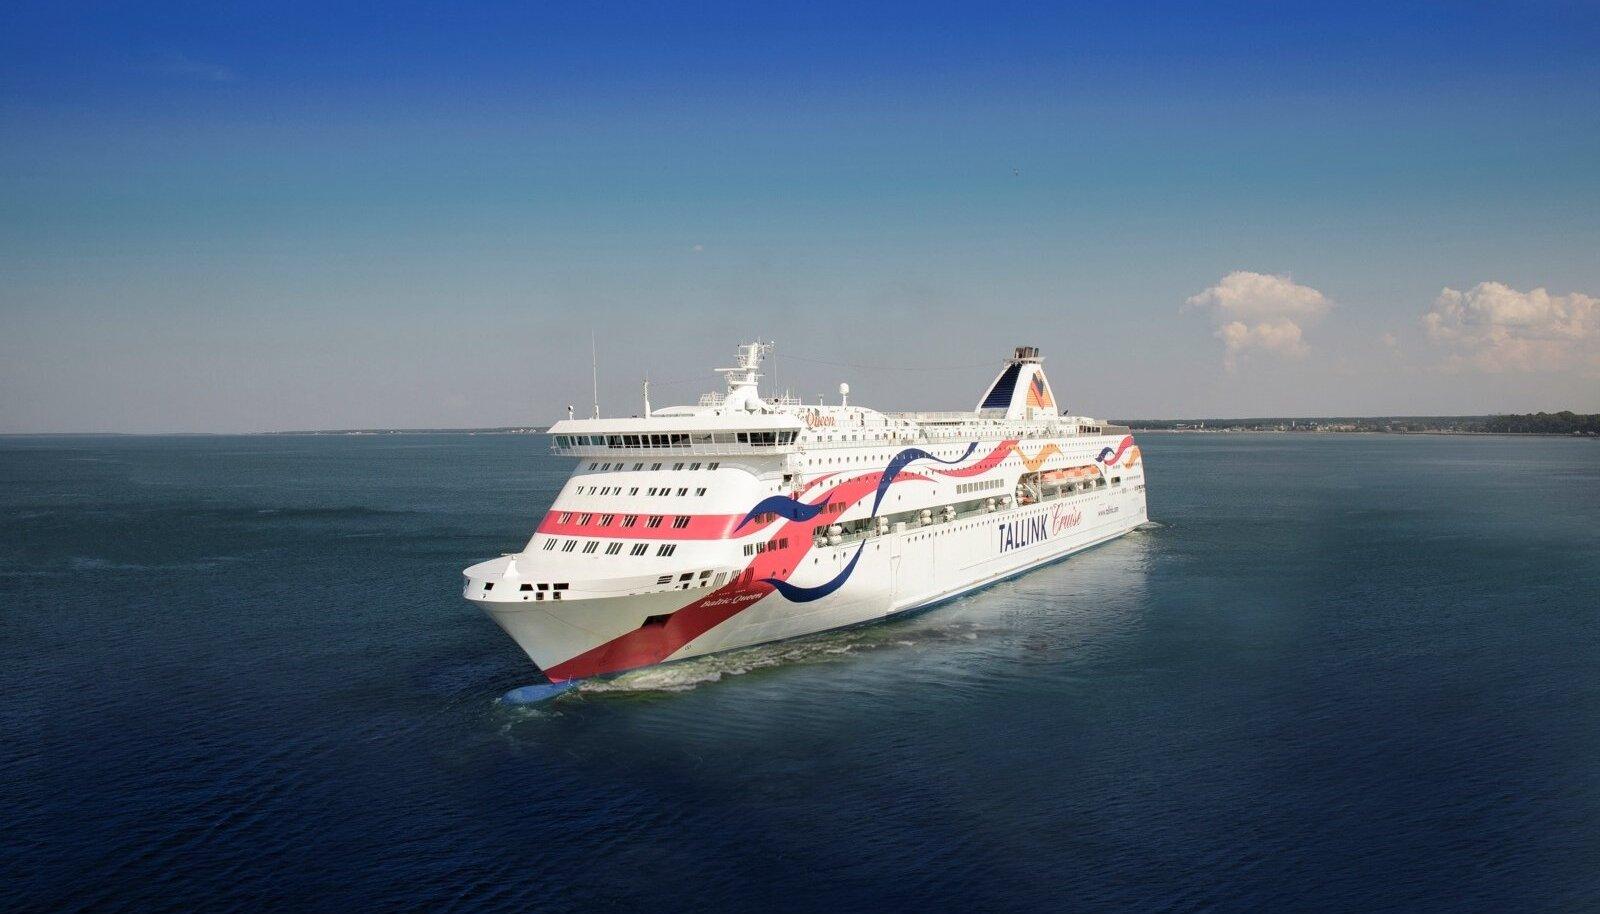 Tallinki laev Baltic Queen